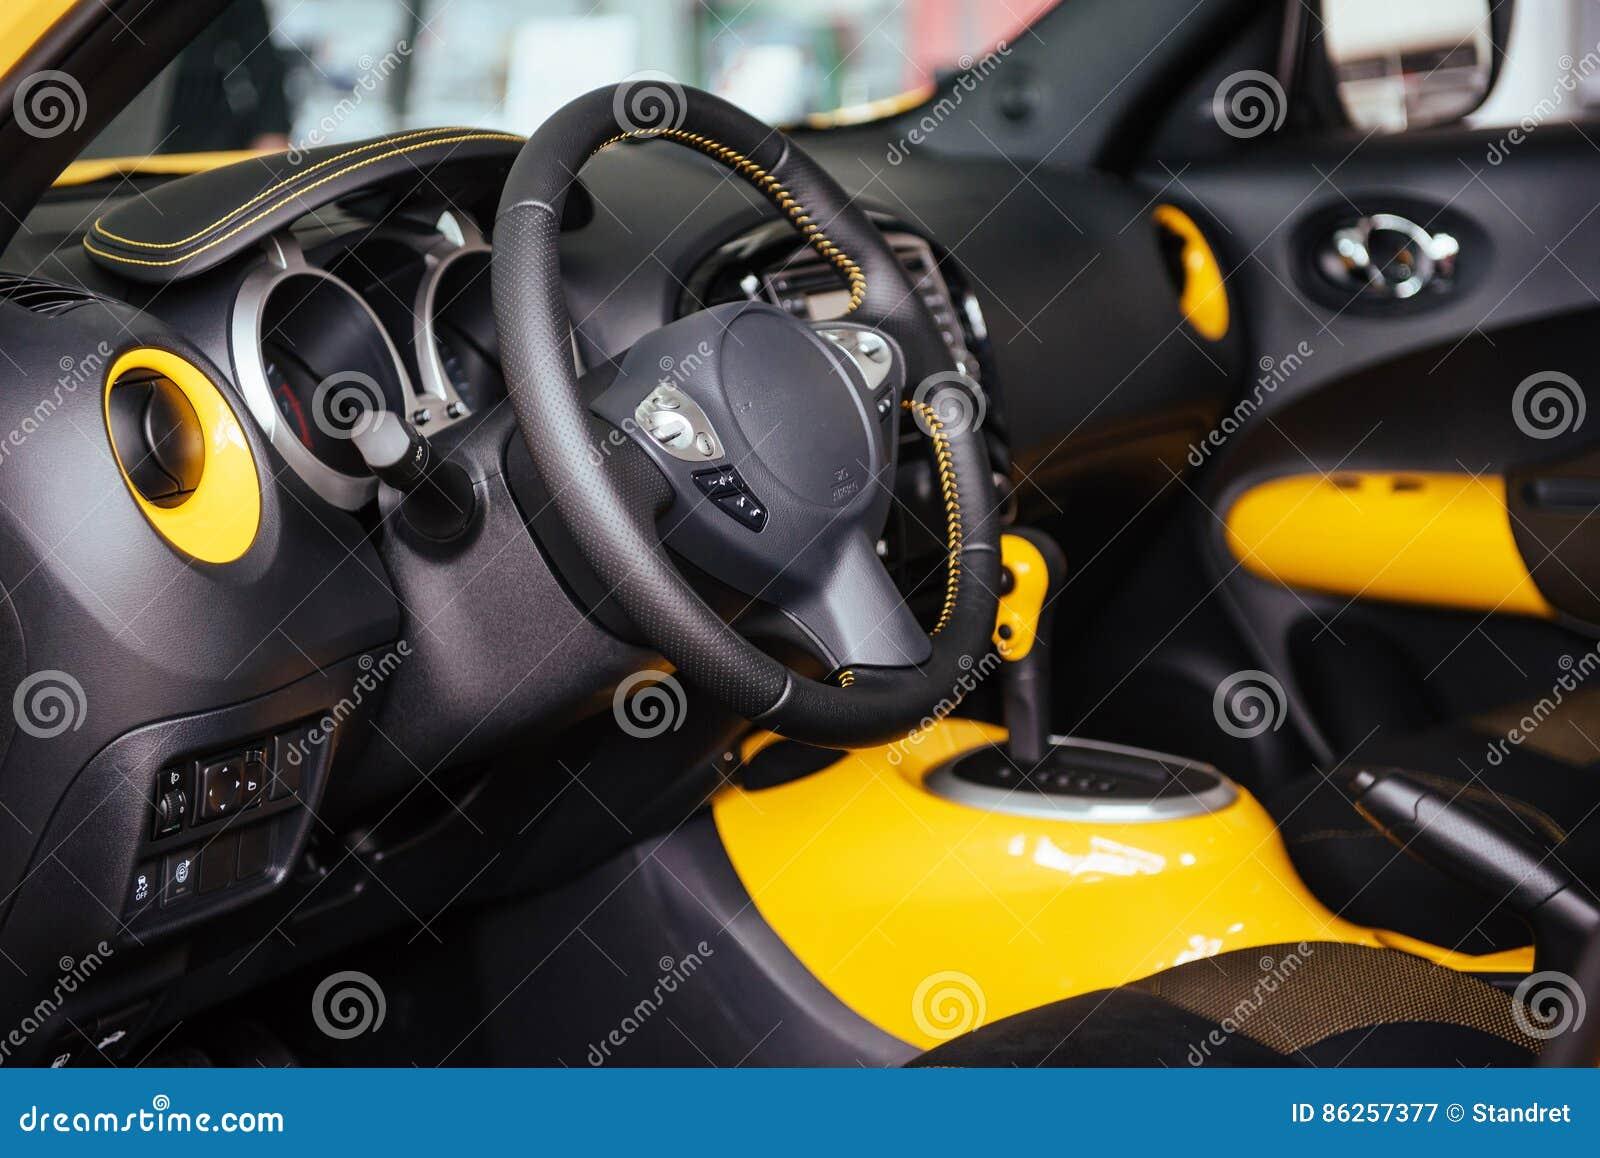 Innenarmaturenbrett des modernen autos und lenkrad stockbild